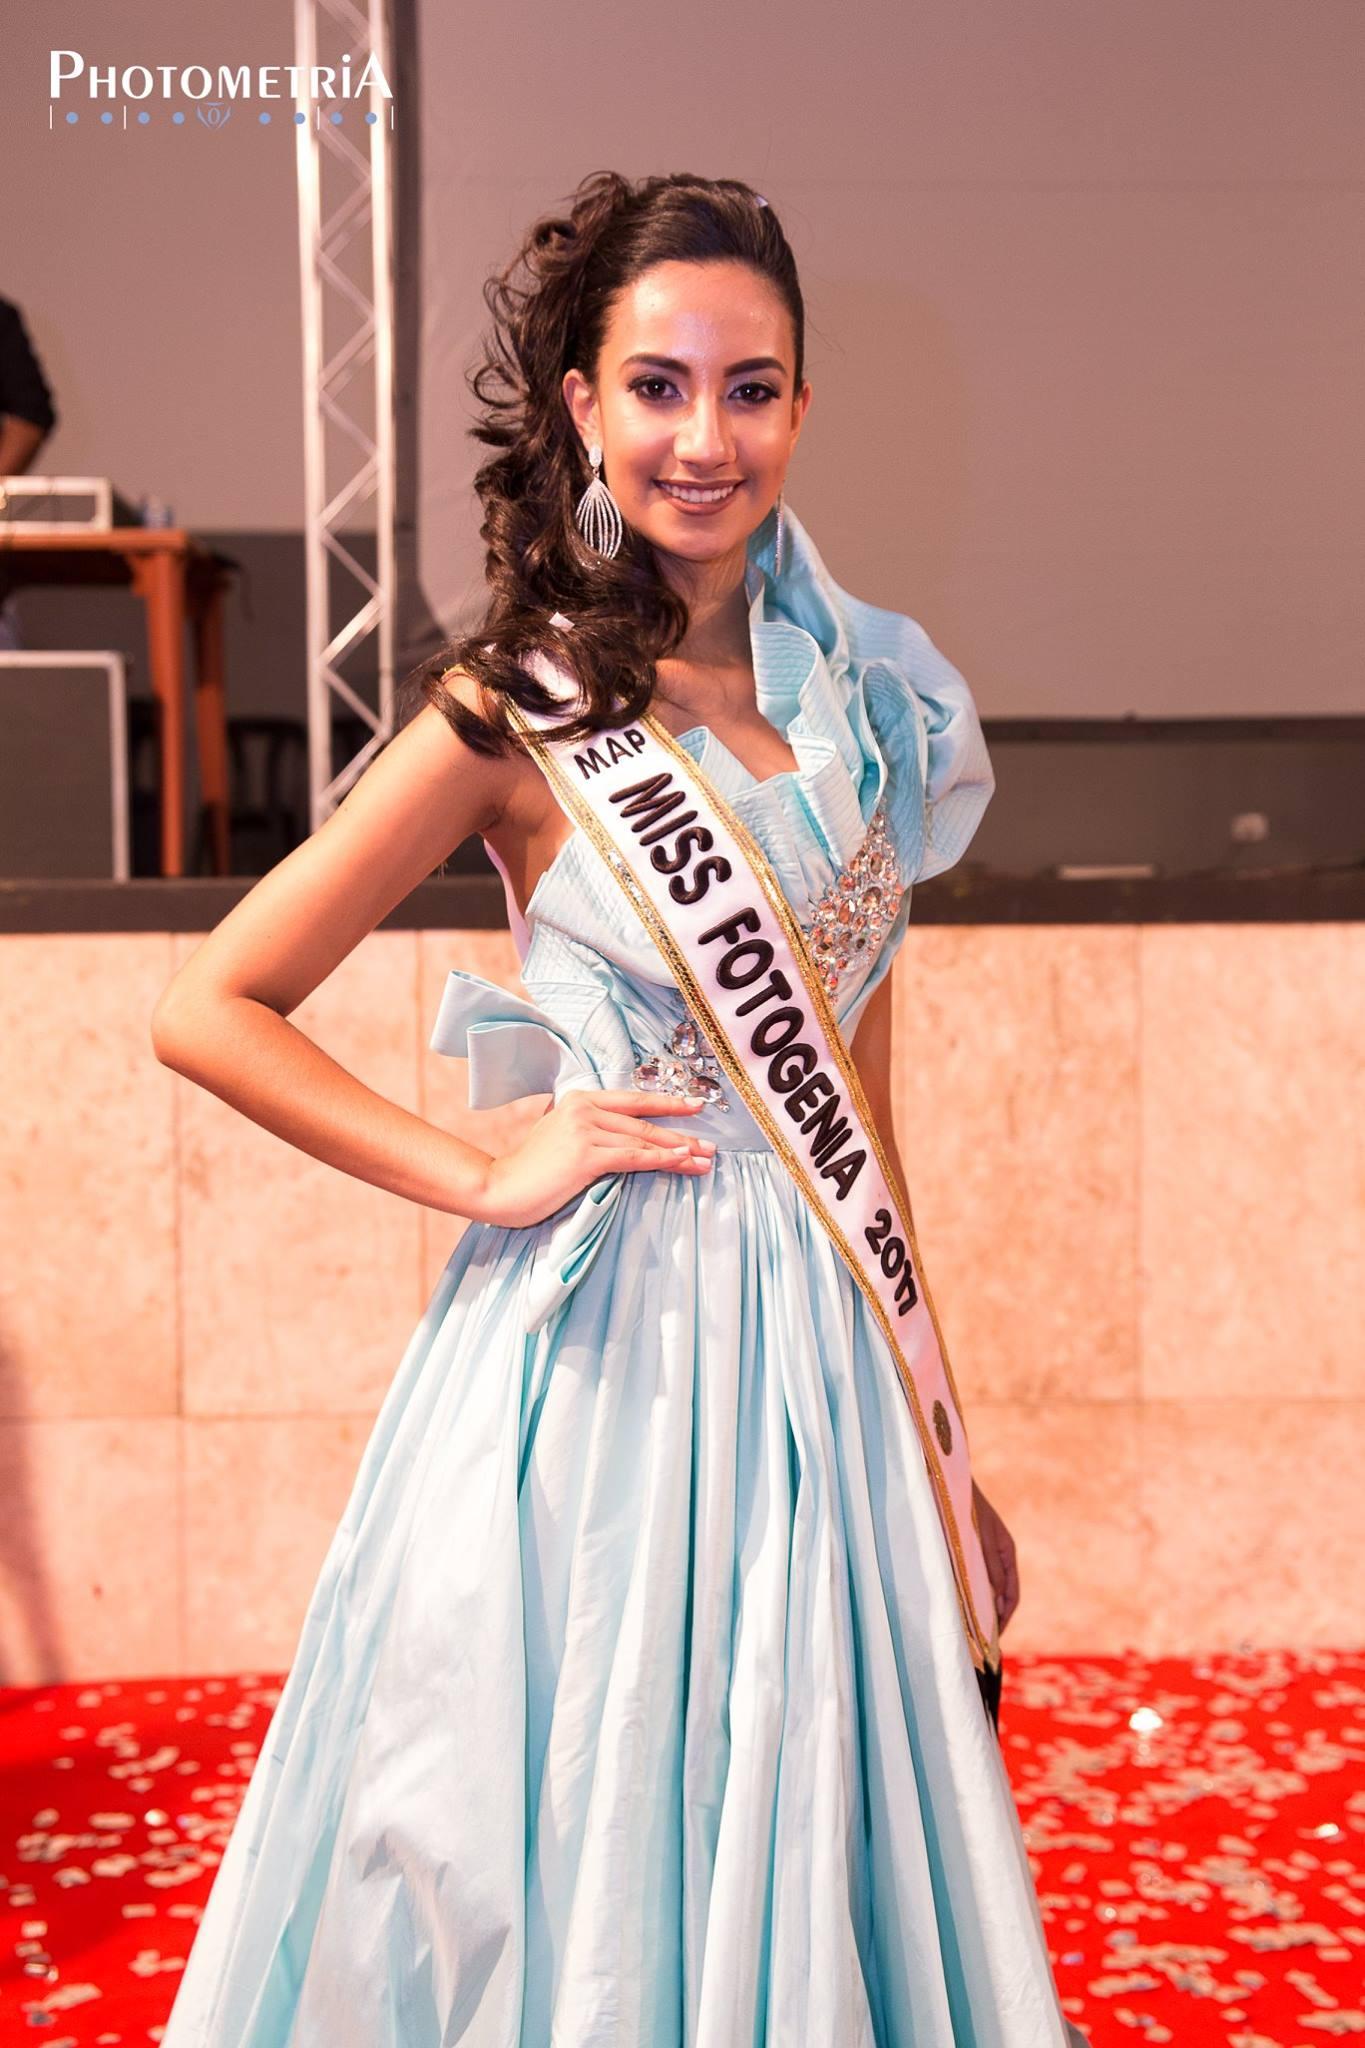 sandy menezes, miss grande sao paulo mundo 2019. Pxqwc10